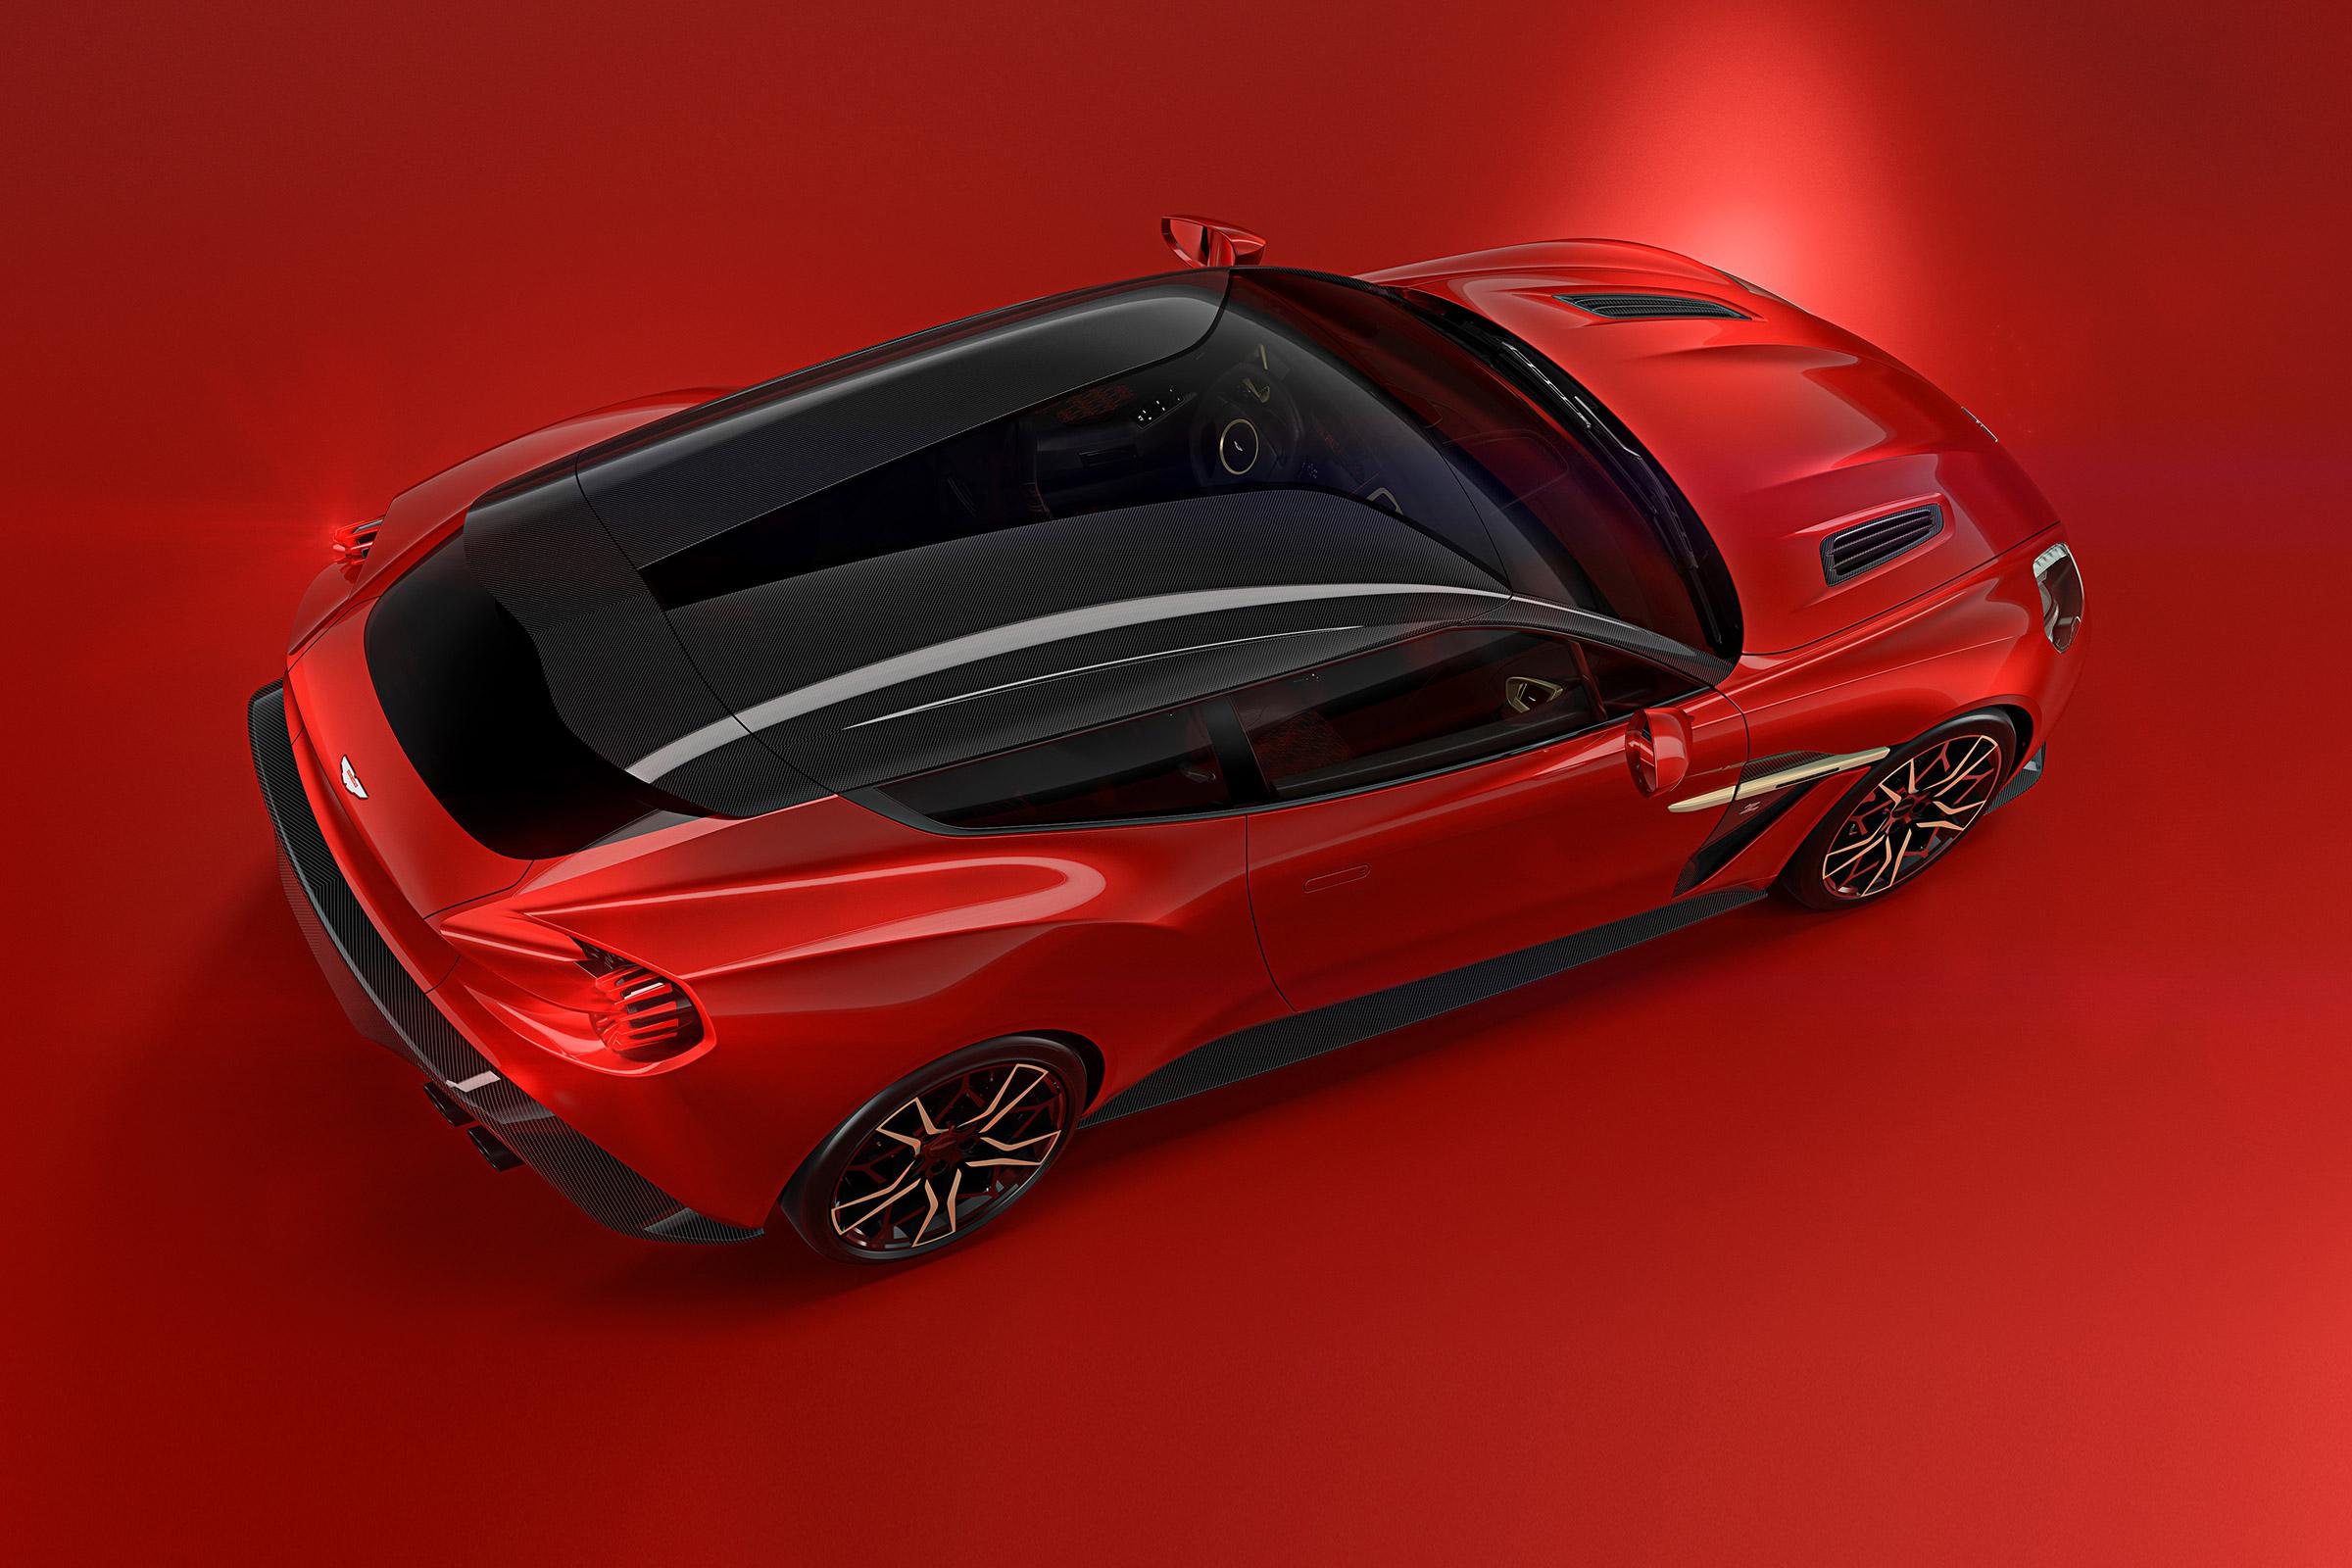 Aston Martin Vanquish Zagato Shooting Brake And Speedster More Images Released Evo